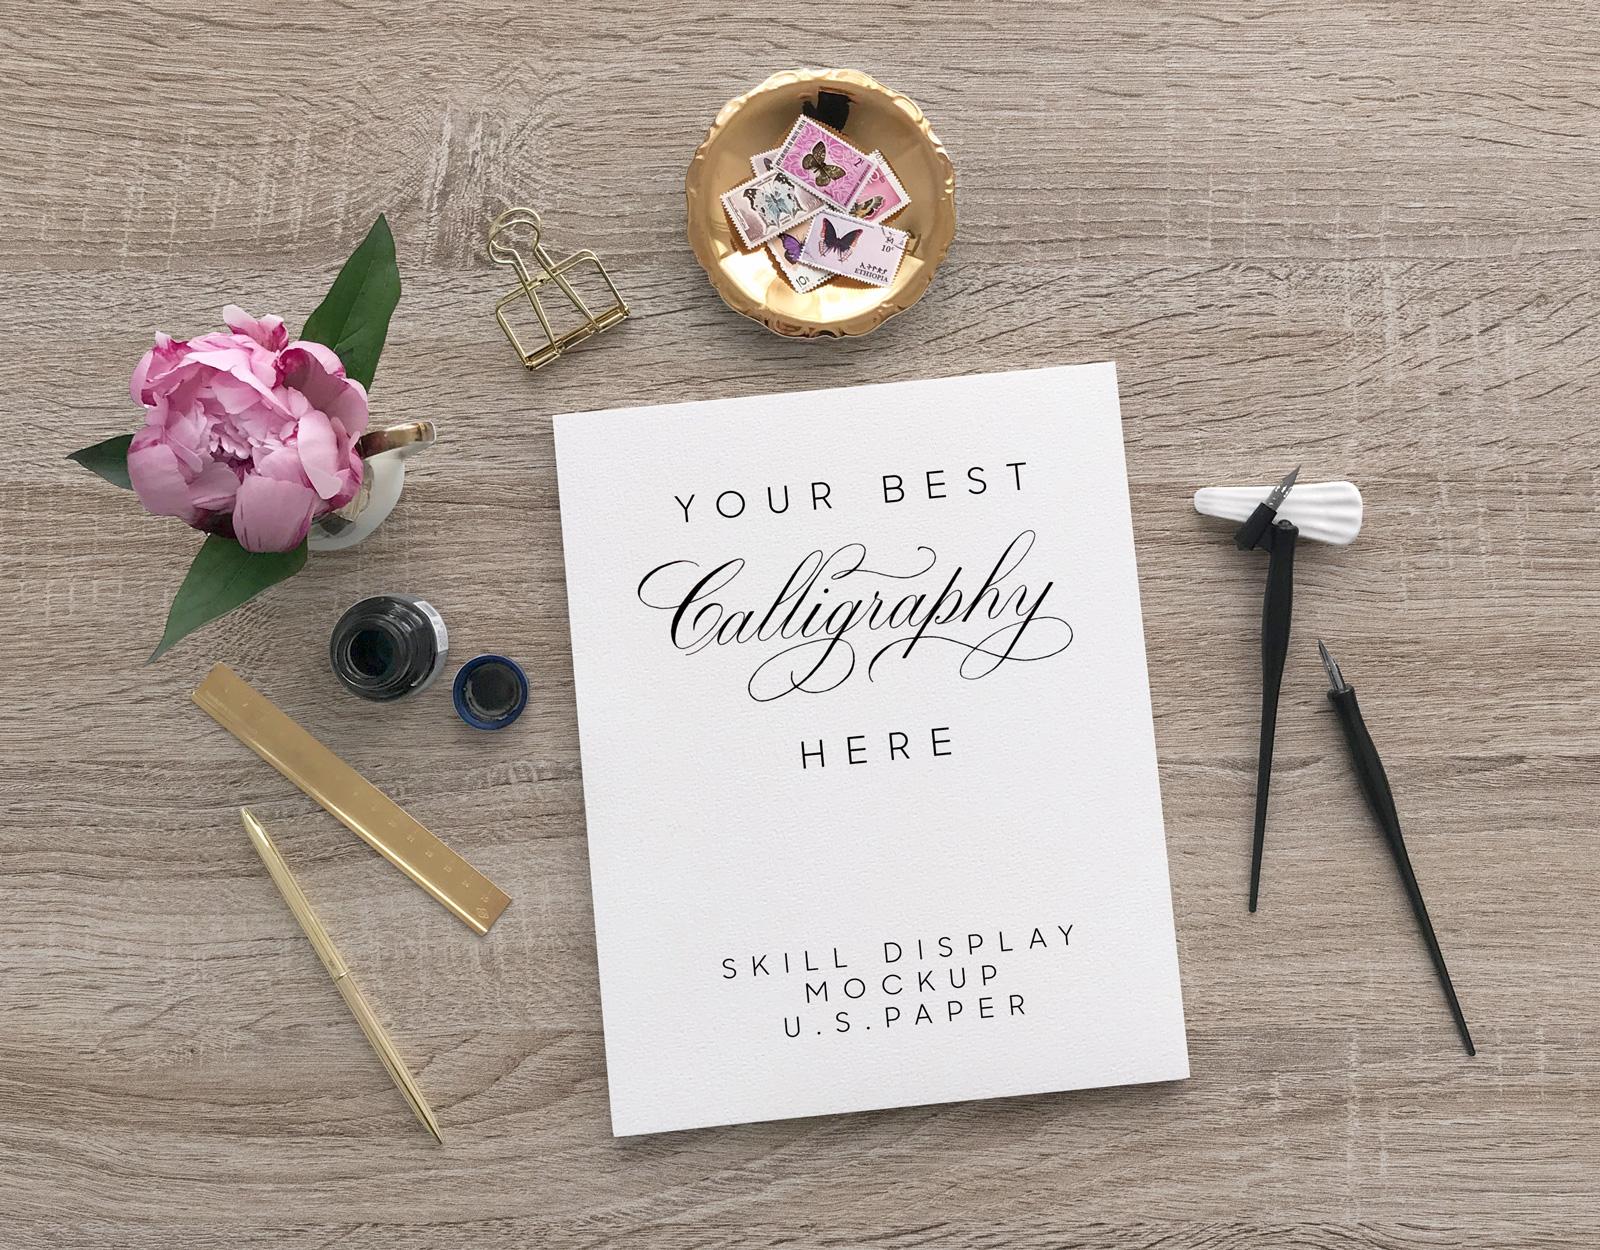 Free U.S. Paper Size Letterhead / Calligraphy Mockup PSD